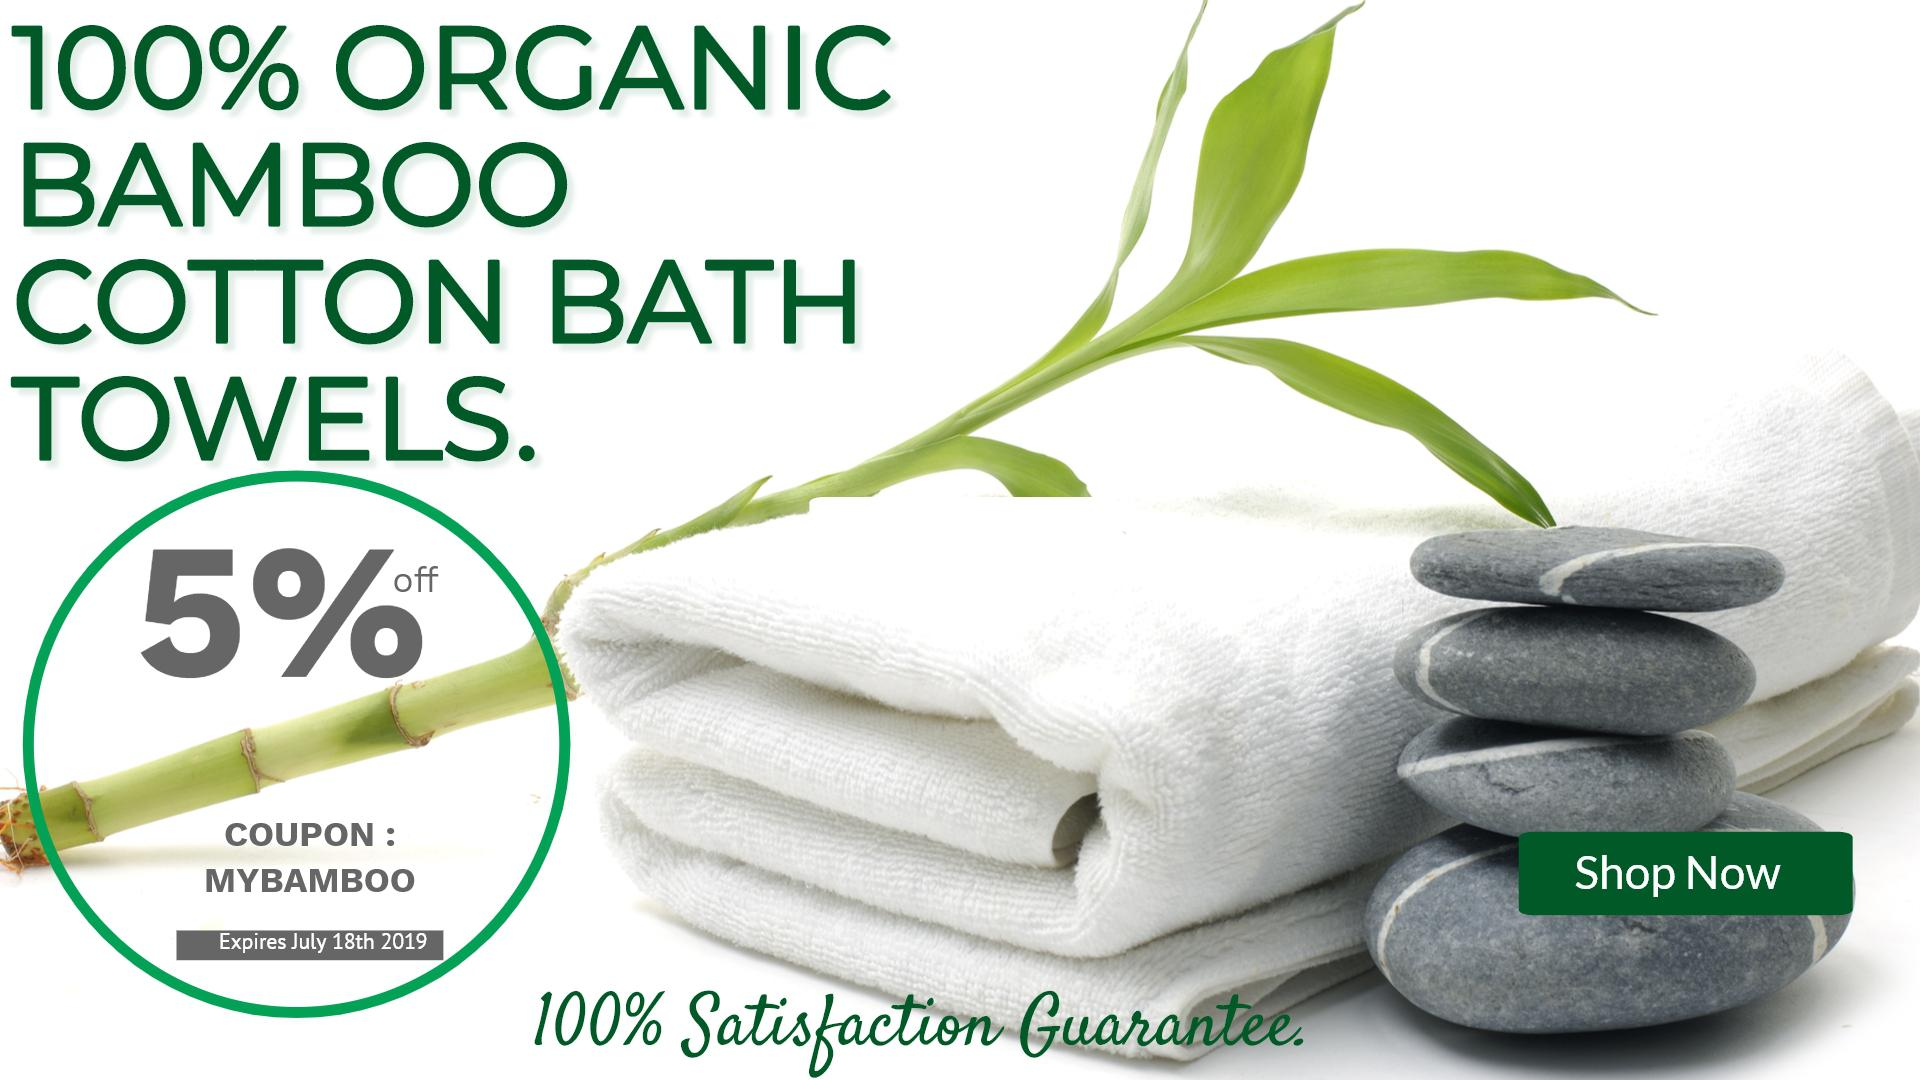 100% Organic Bamboo Towels